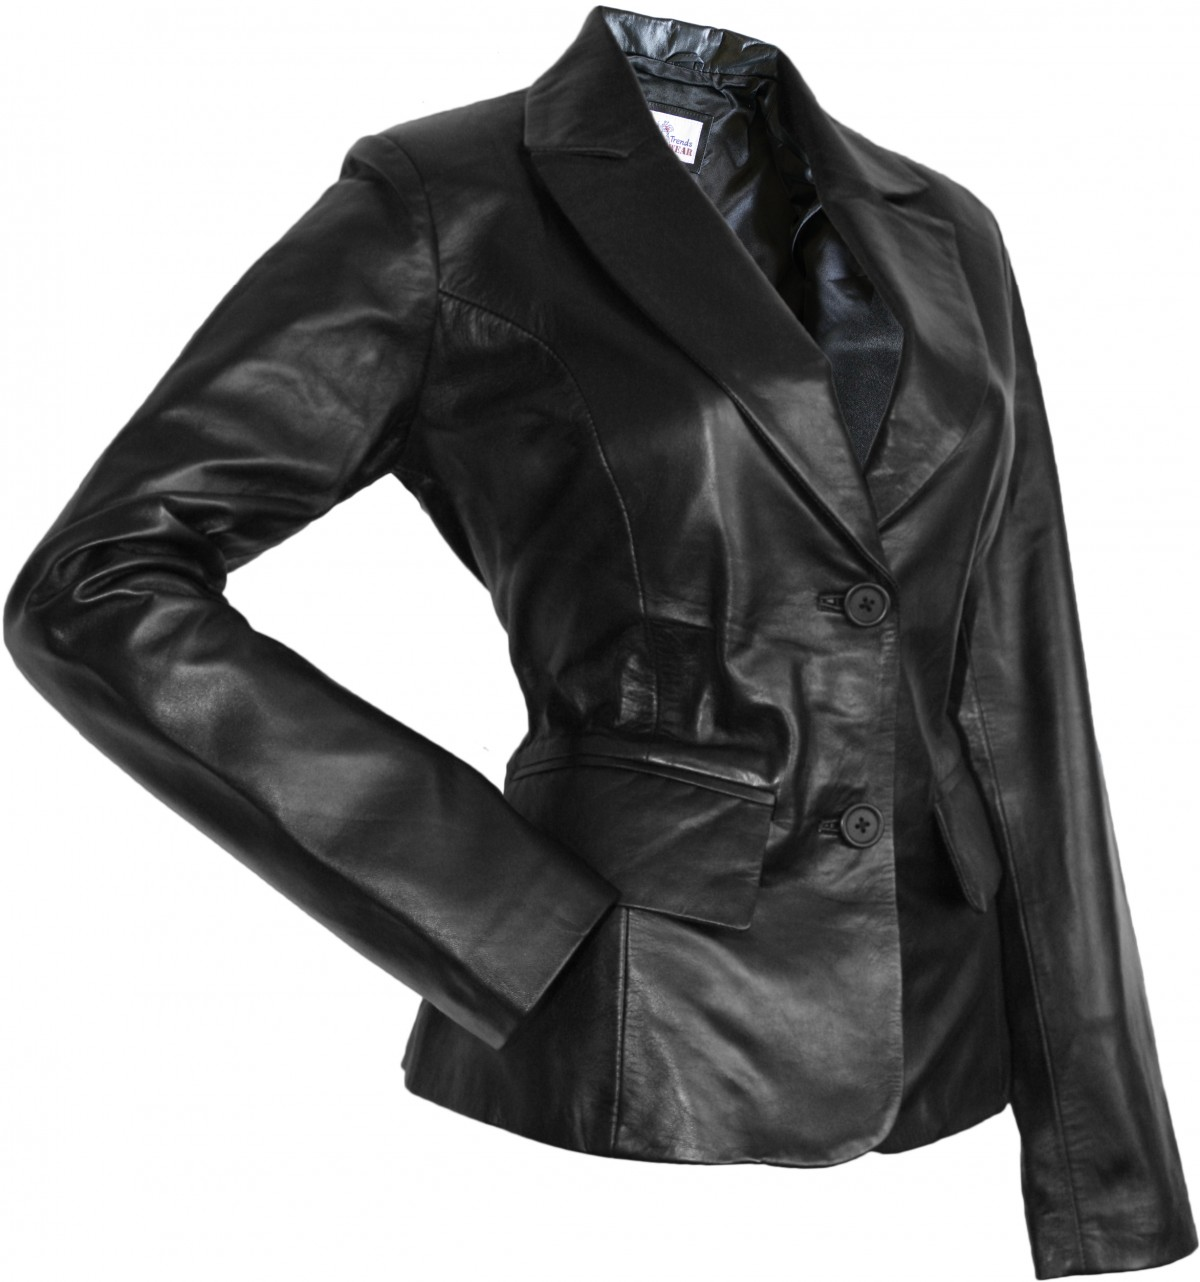 damen lederblazer lederjacke blazer echtleder jacke aus lammnappa leder schwarz. Black Bedroom Furniture Sets. Home Design Ideas